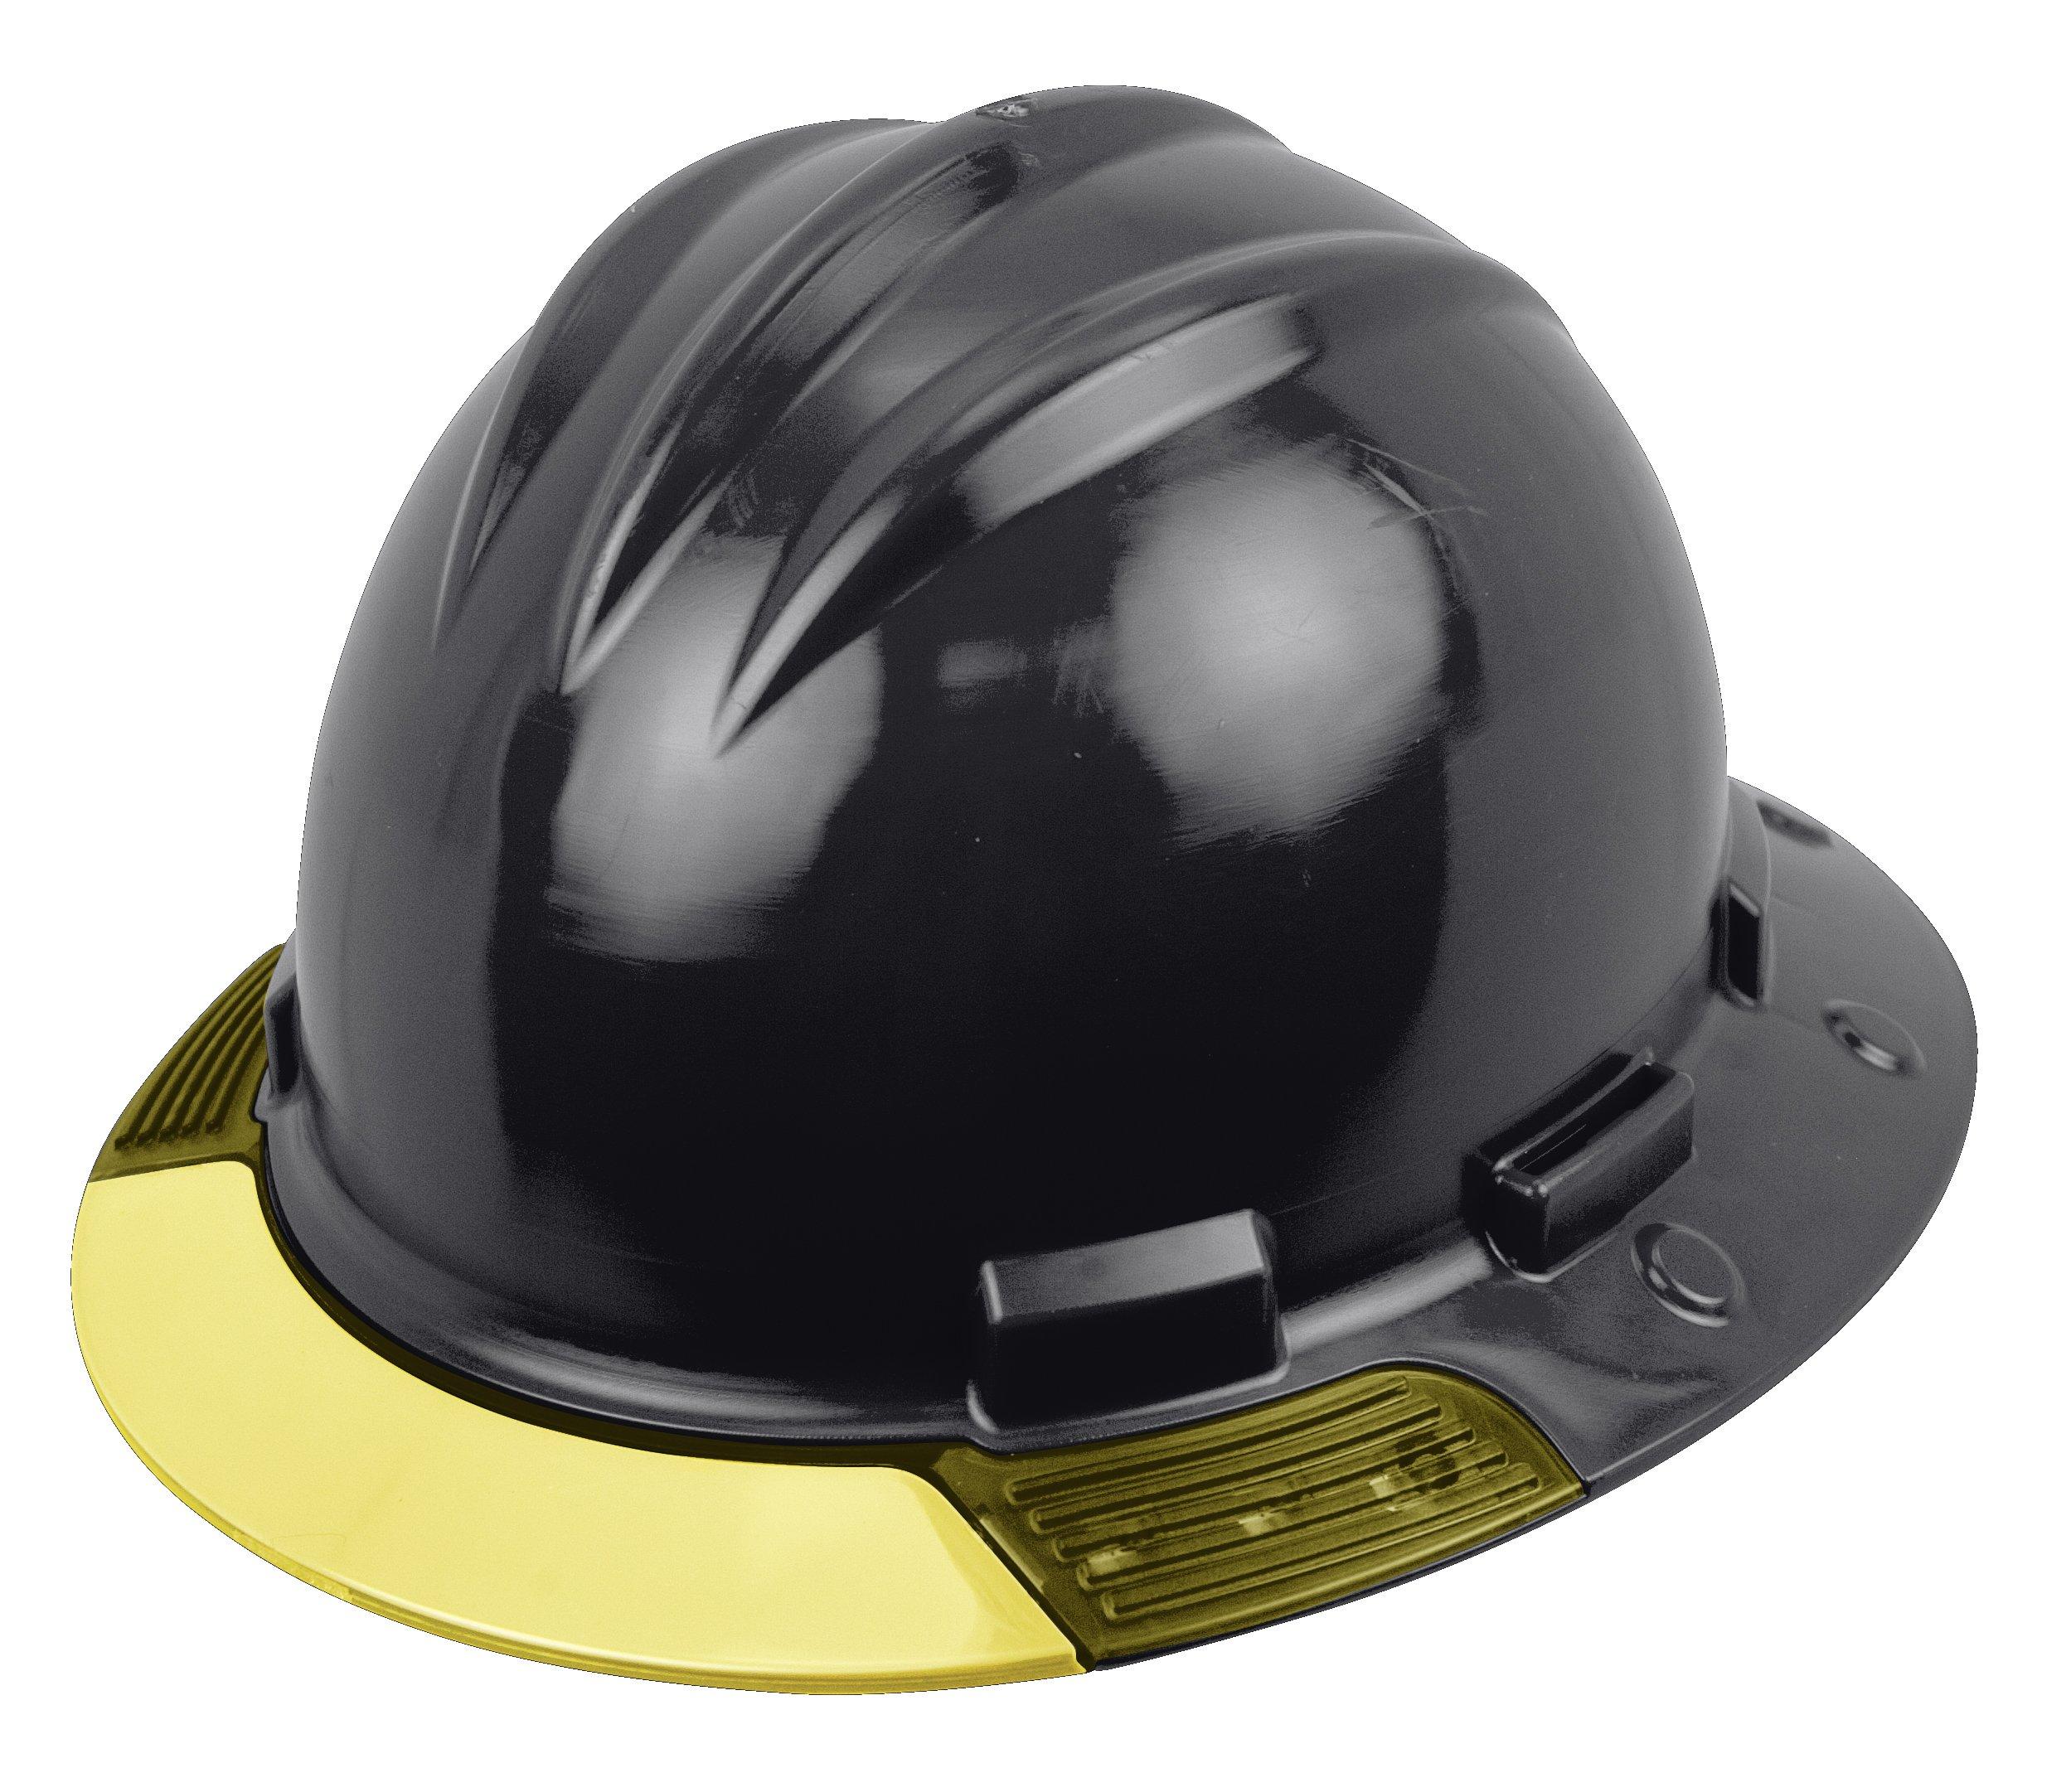 Bullard AVBKRY Above View Hard Hat, Black, Cotton Brow Pad, Ratchet Suspension, Yellow Visor, One Size by Bullard